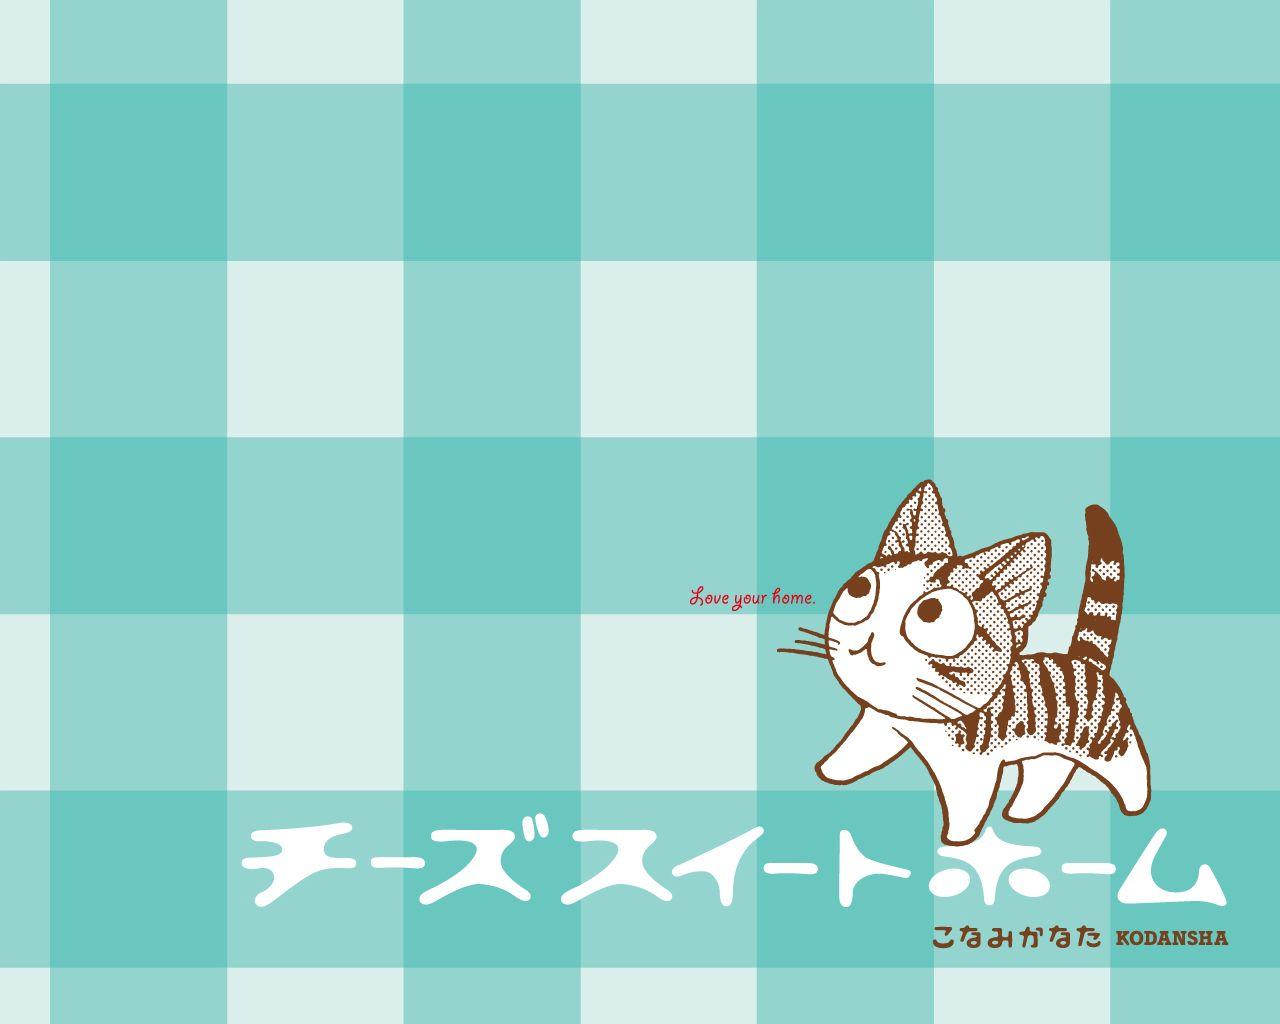 sweet home wallpaper designs. animu ru chi sweet home 1280x1024 wallpaper  005 jpg 1280 1024